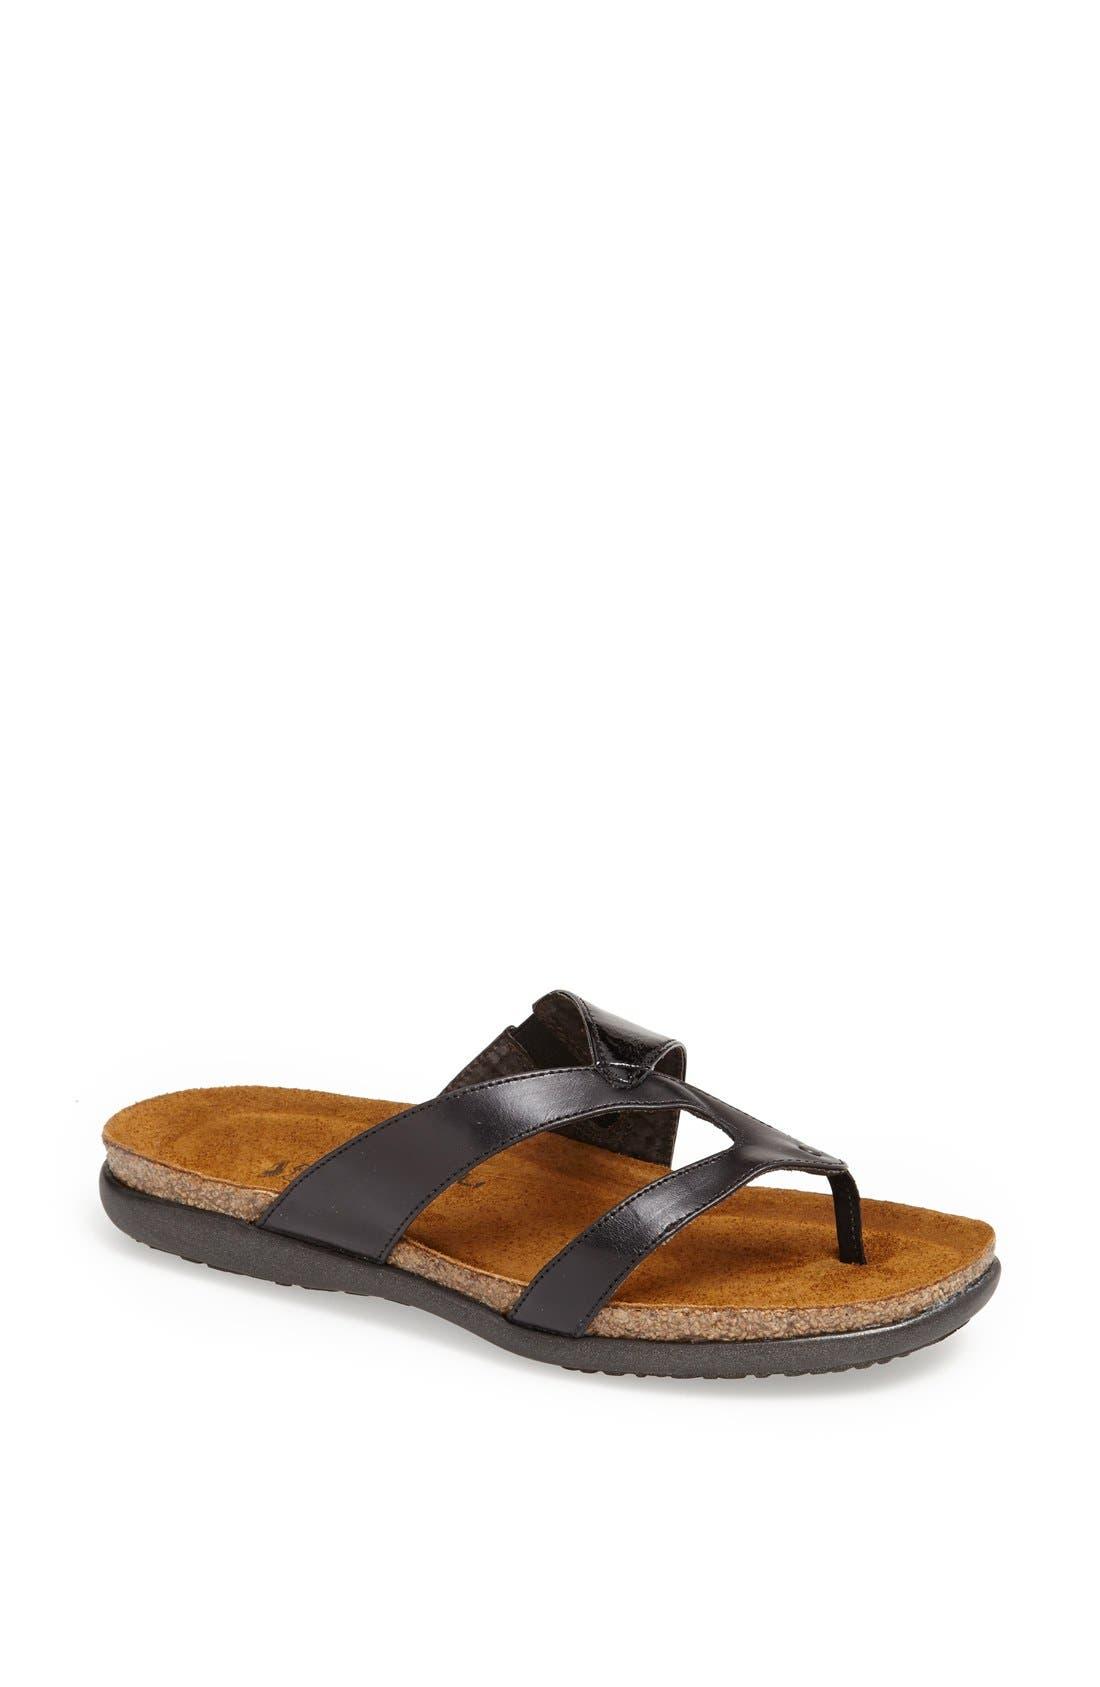 NAOT 'Francine' Sandal